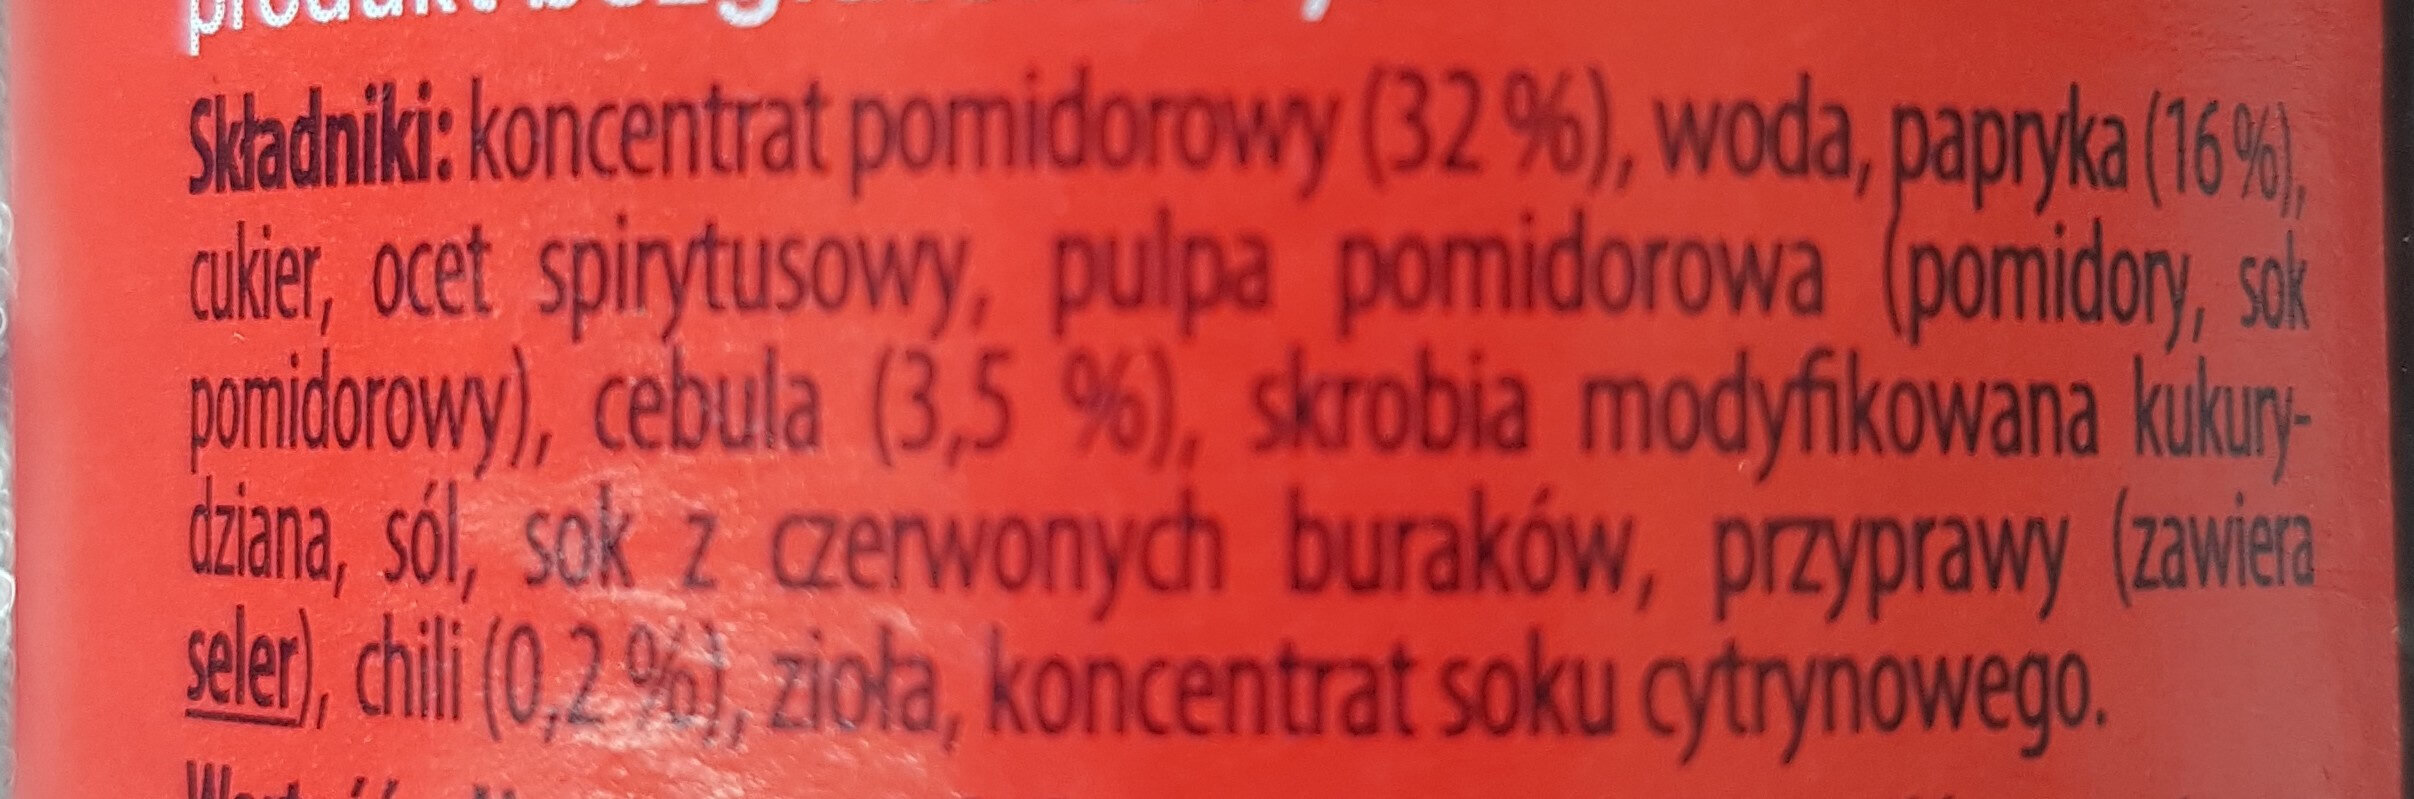 Sos chilli pikantny - Składniki - pl